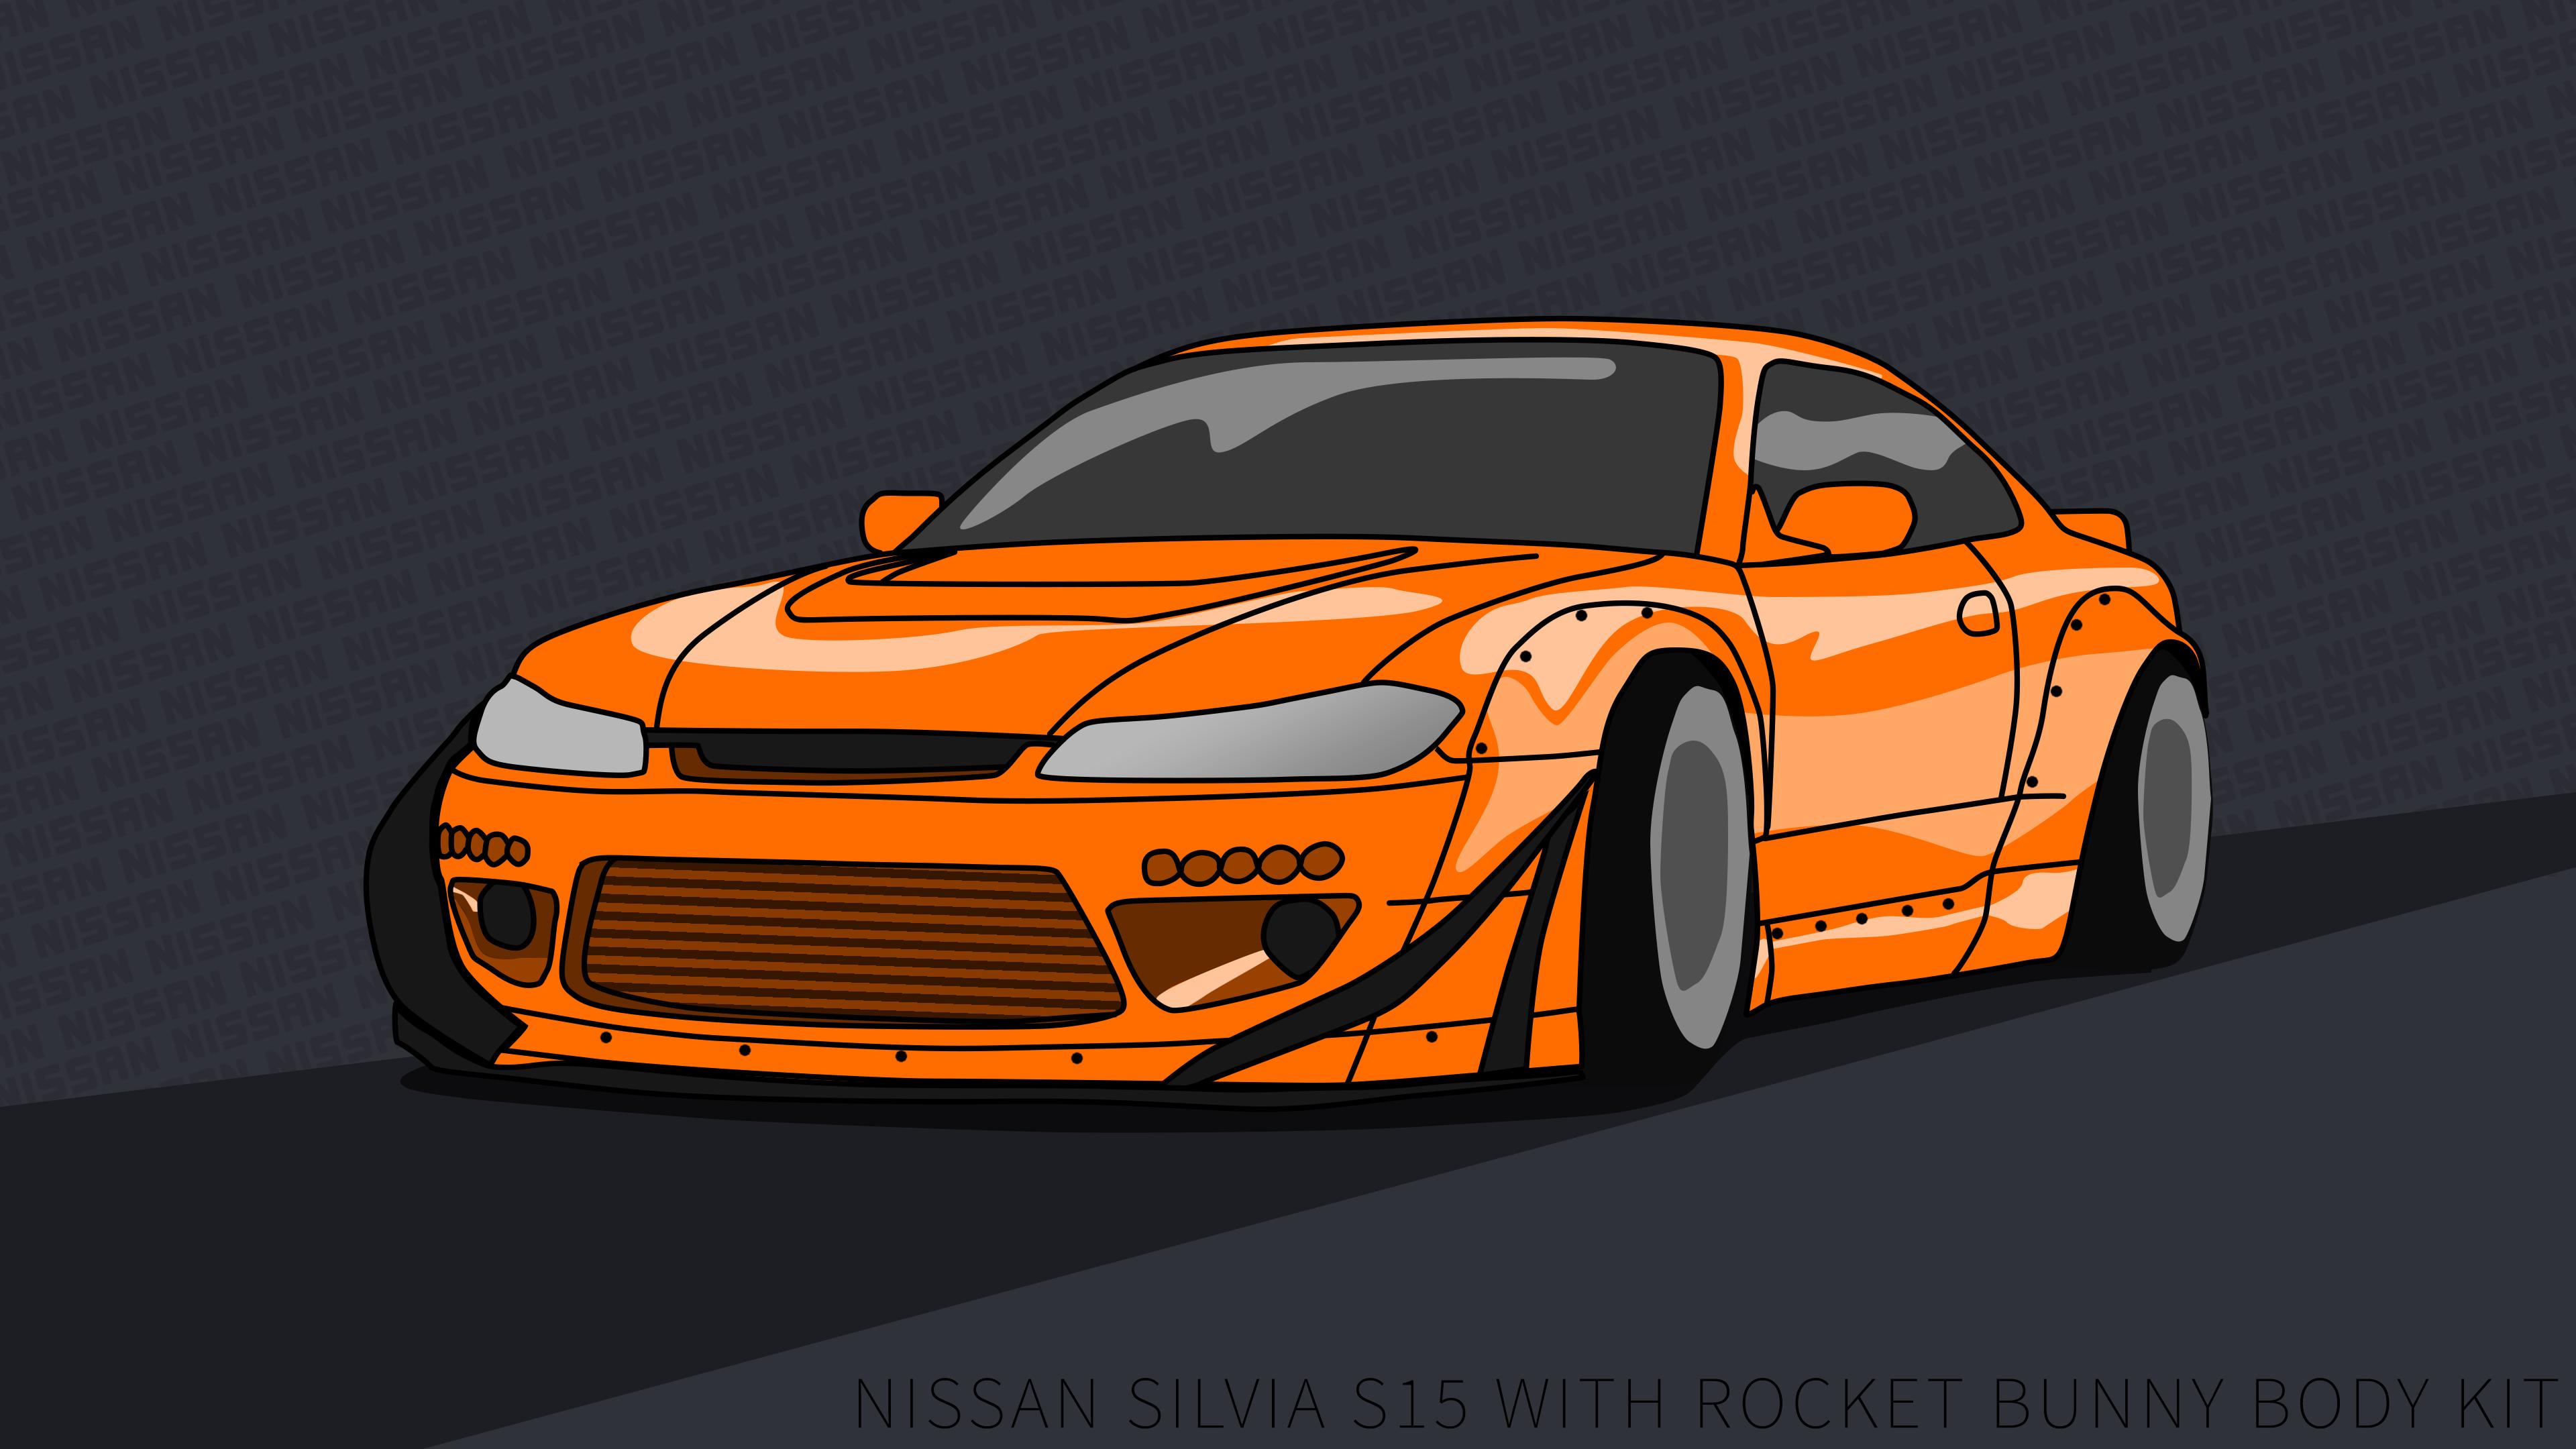 Nissan Silvia S15 Wallpaper 4k Rocket Bunny Orange By